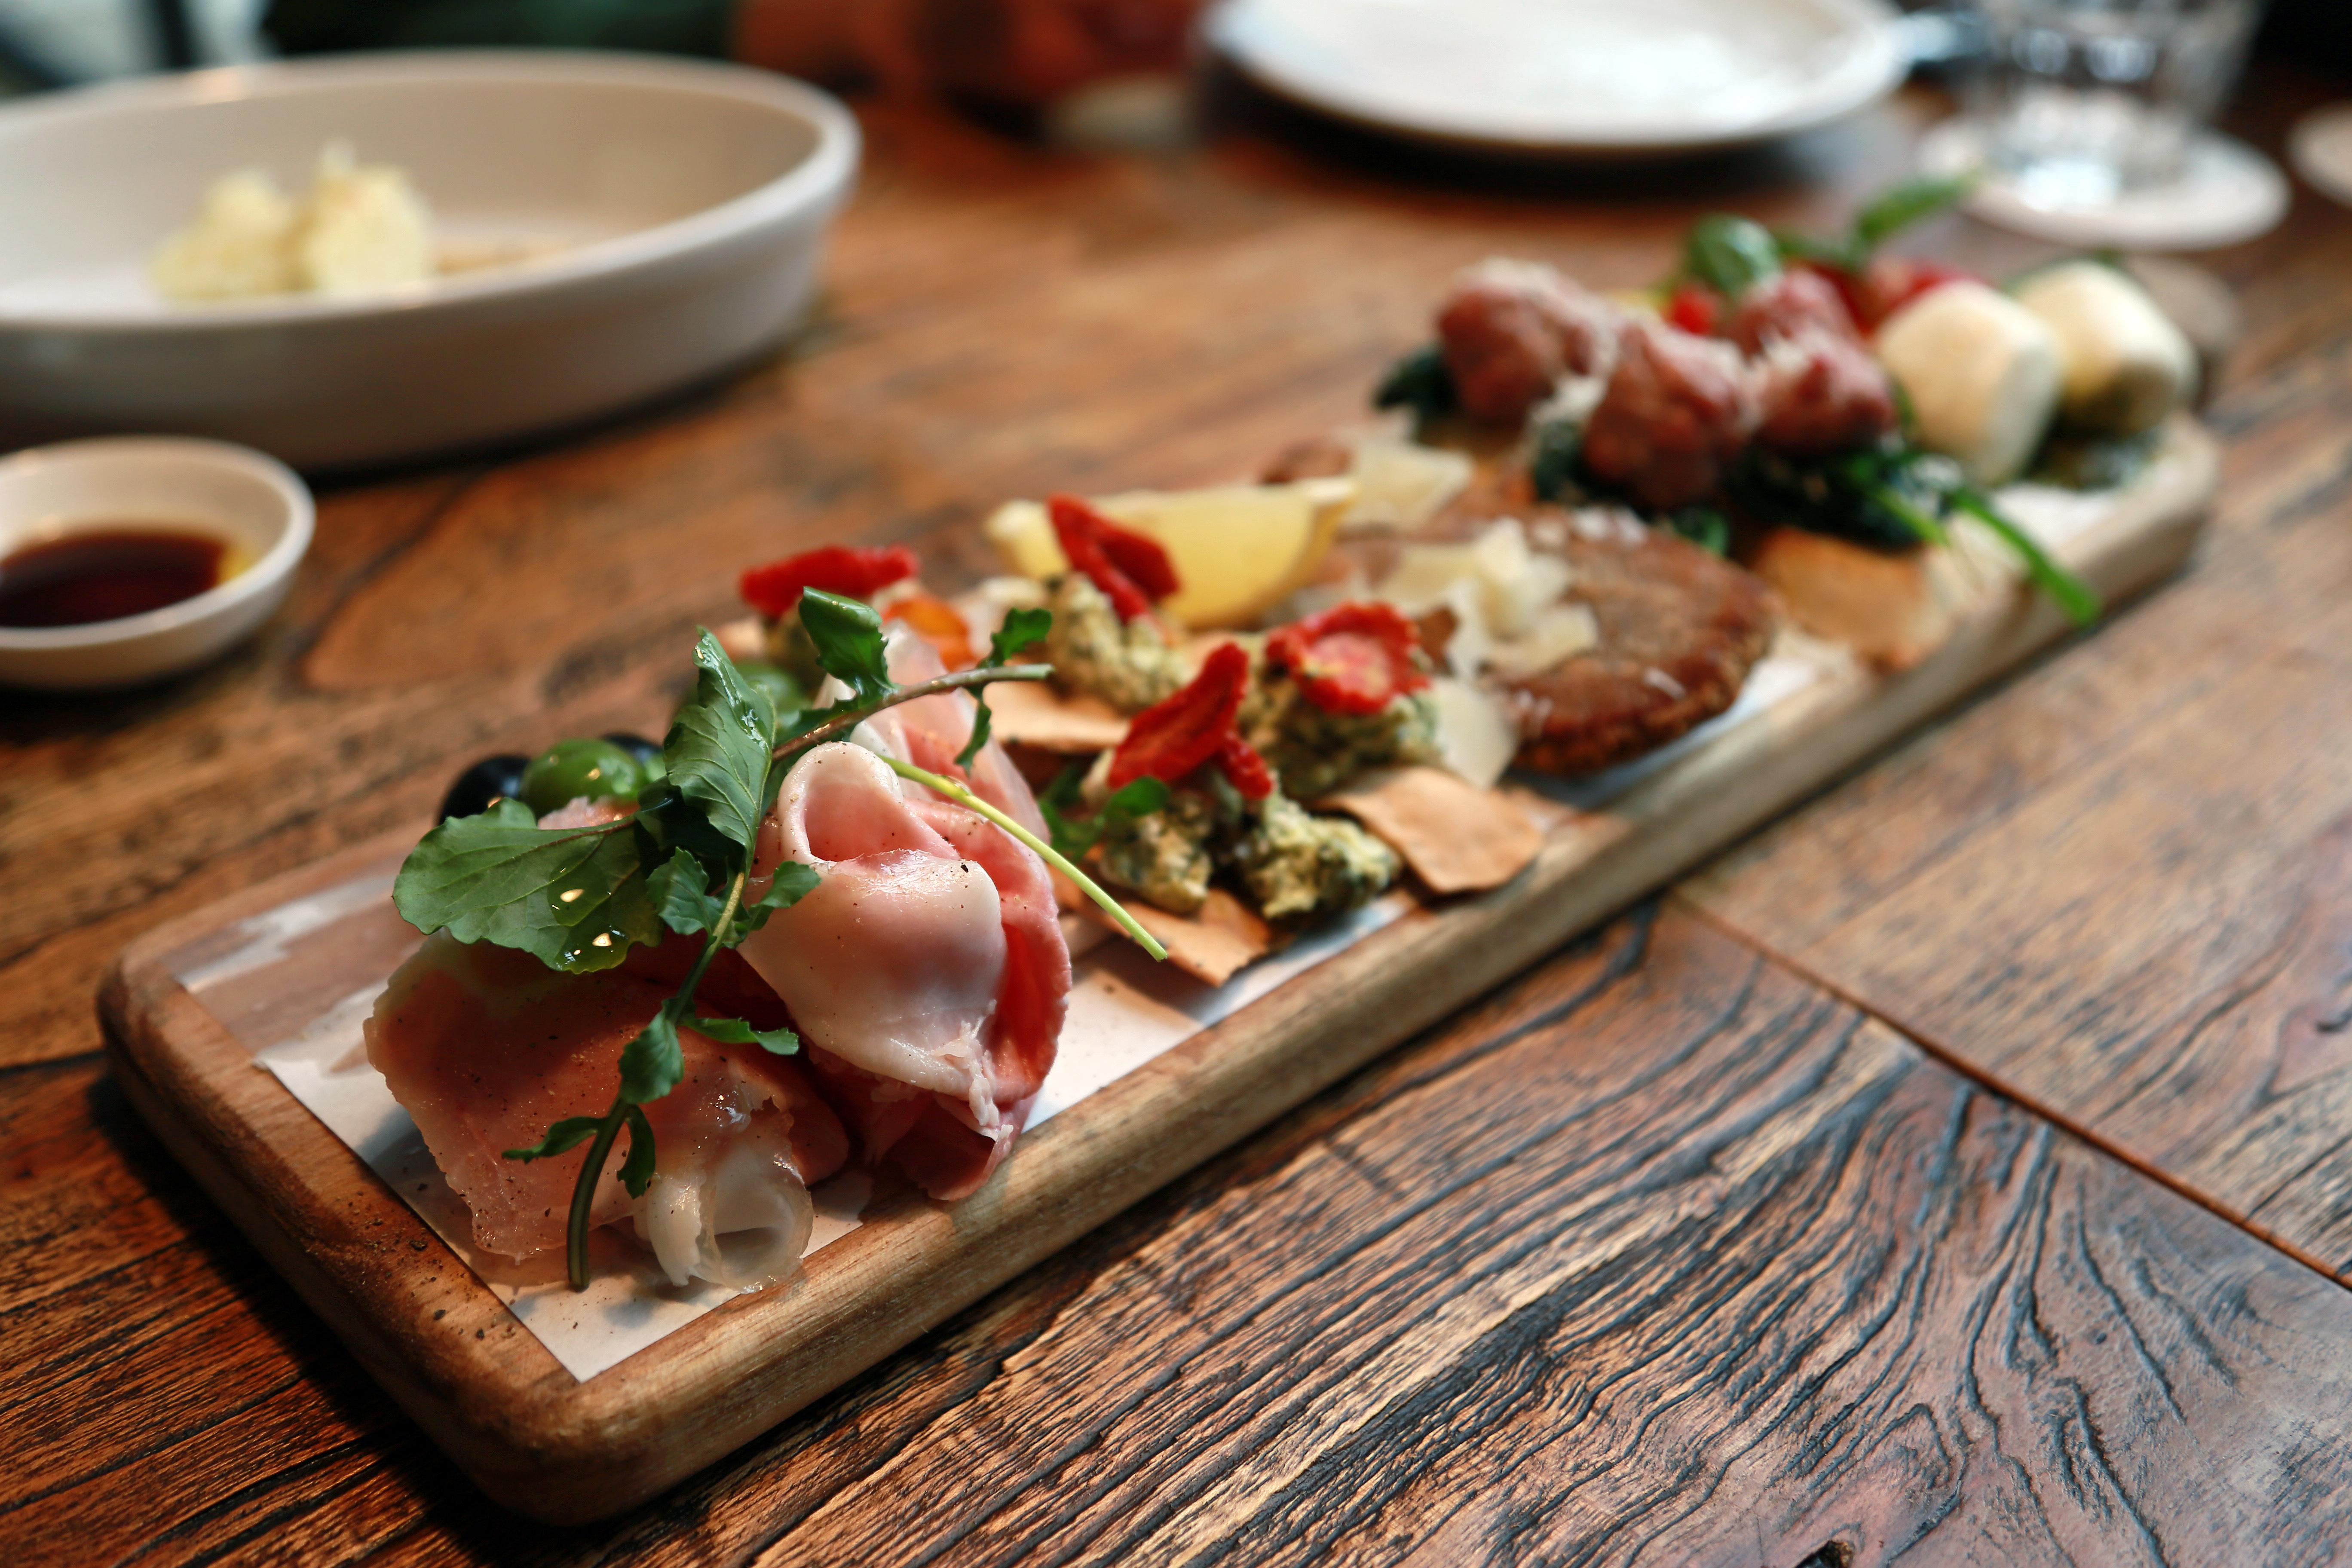 Comida mucha comida iv n korea diversi n for Restaurantes de comida italiana